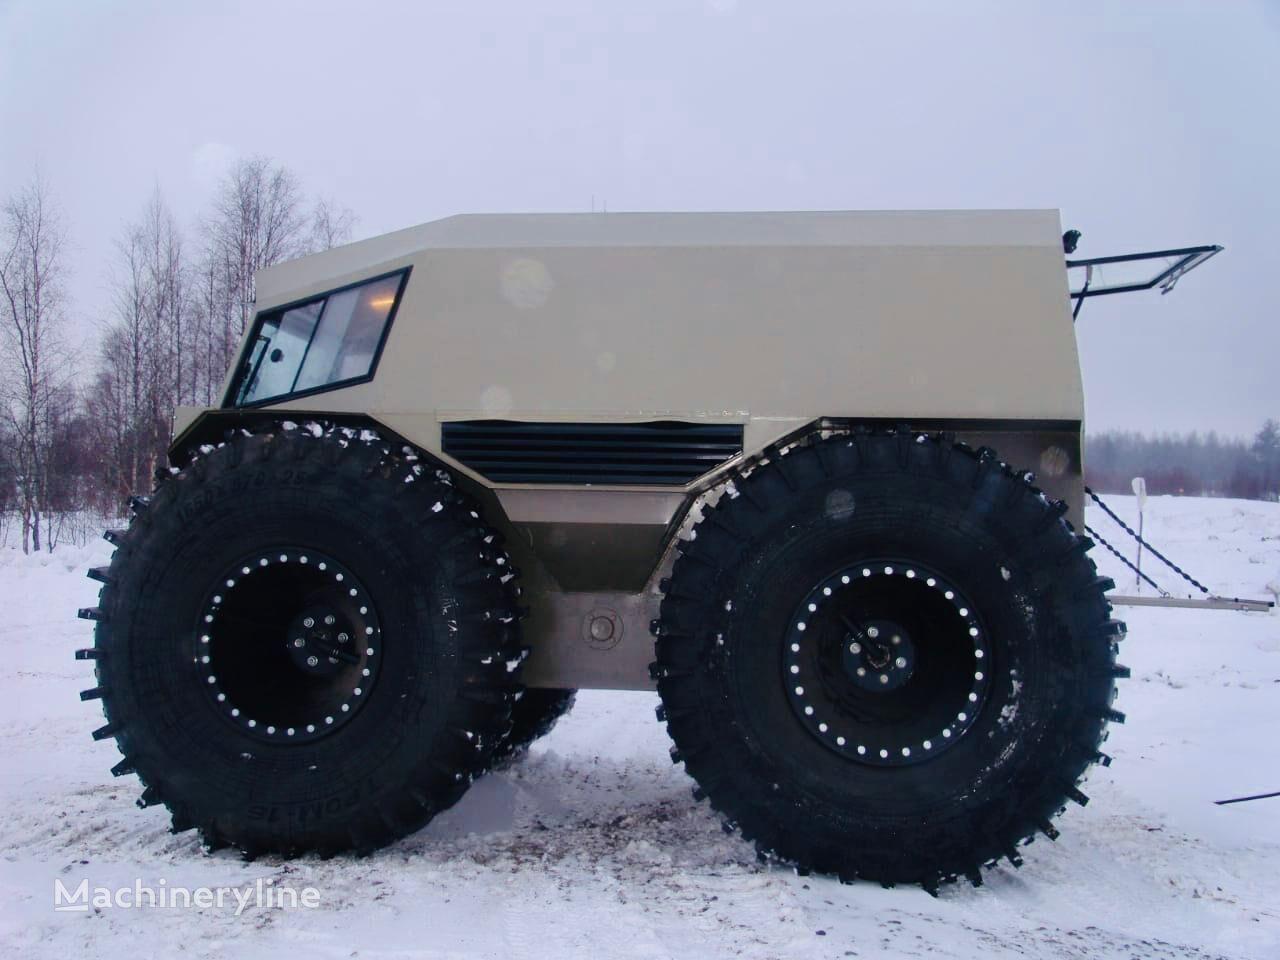 obojživelné terénne vozidlo Test Taifun-1650 ATV